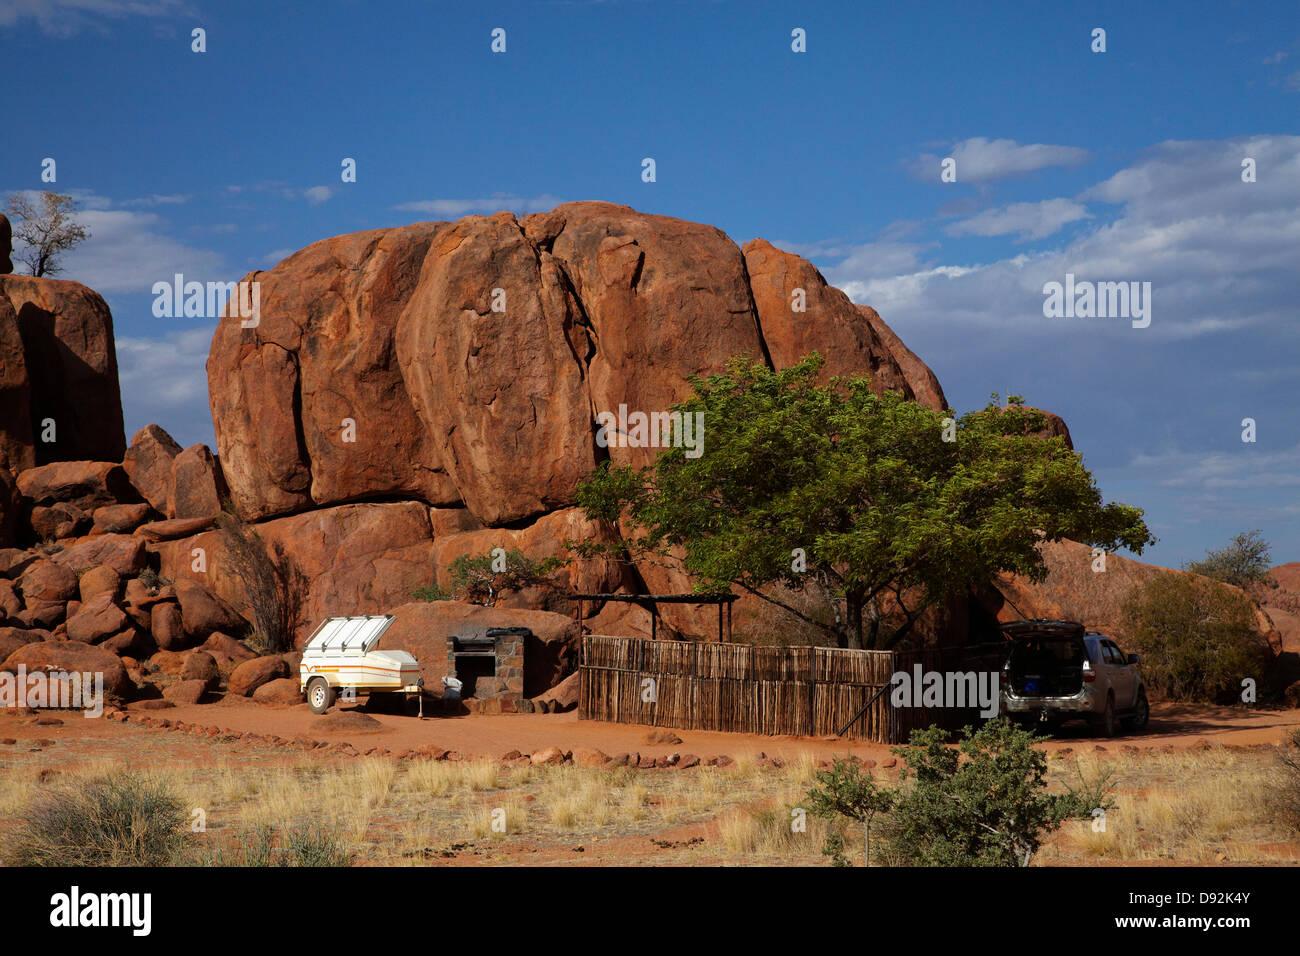 Camp site at Ranch Koiimasis, Tiras Mountains, Southern Namibia, Africa - Stock Image